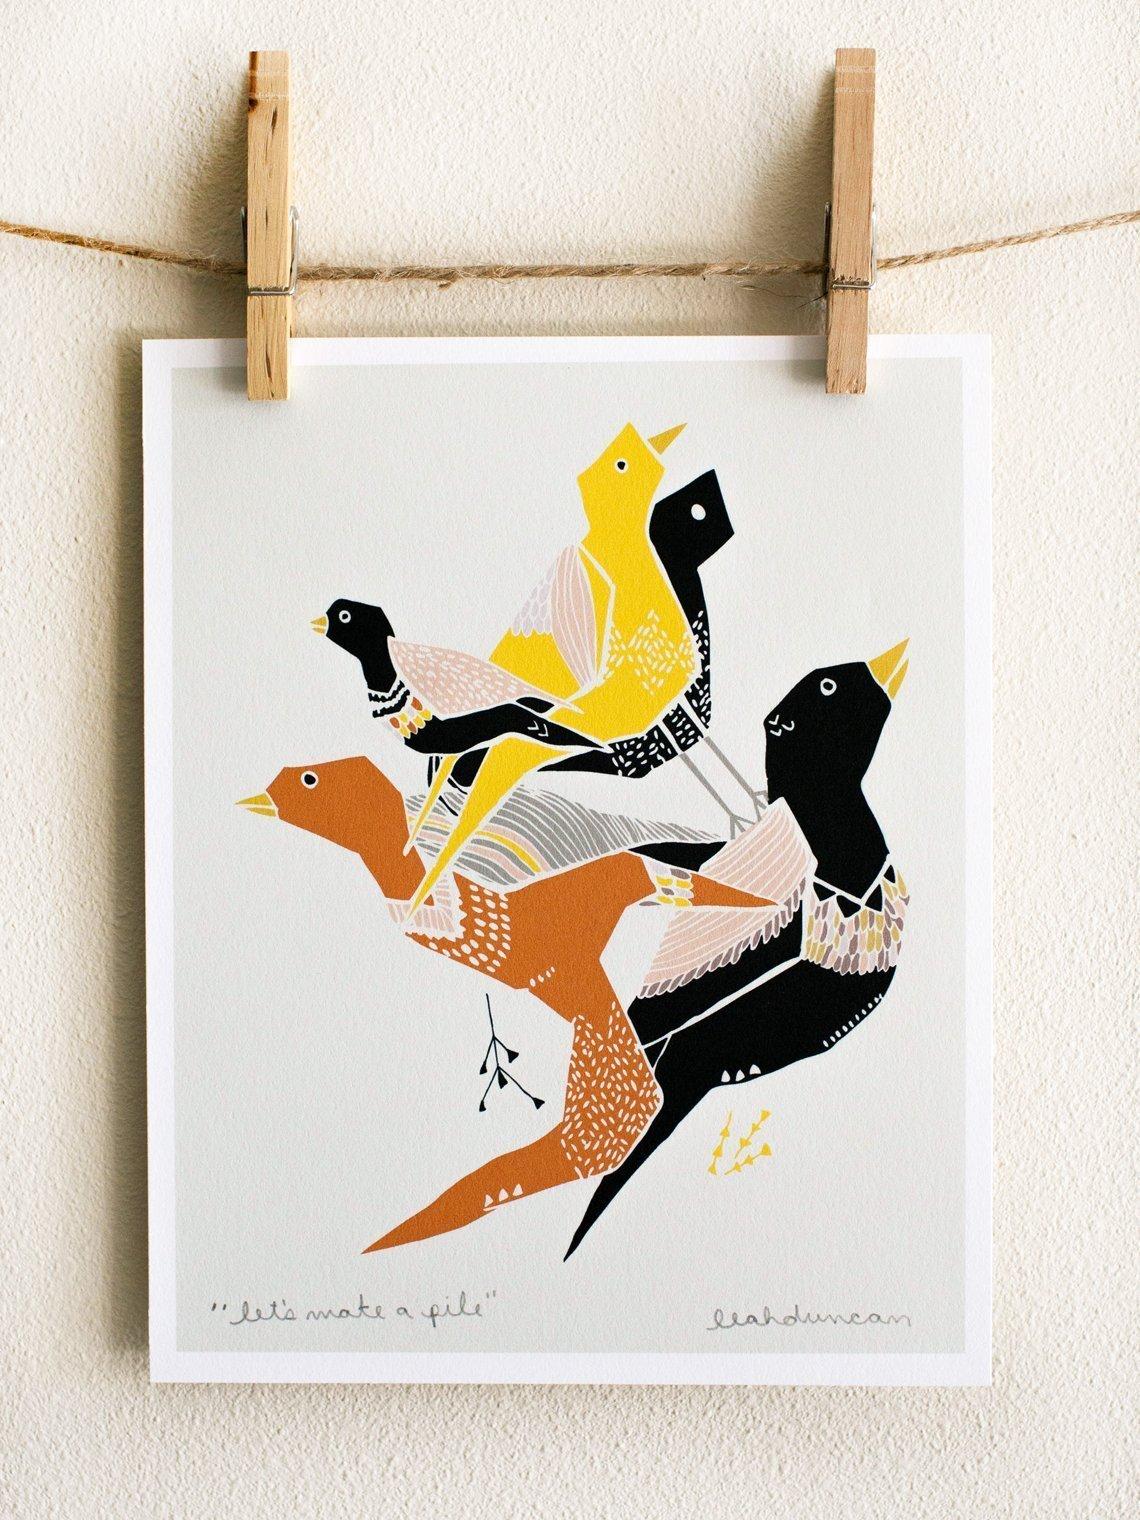 Let's Make a Pile Art Print